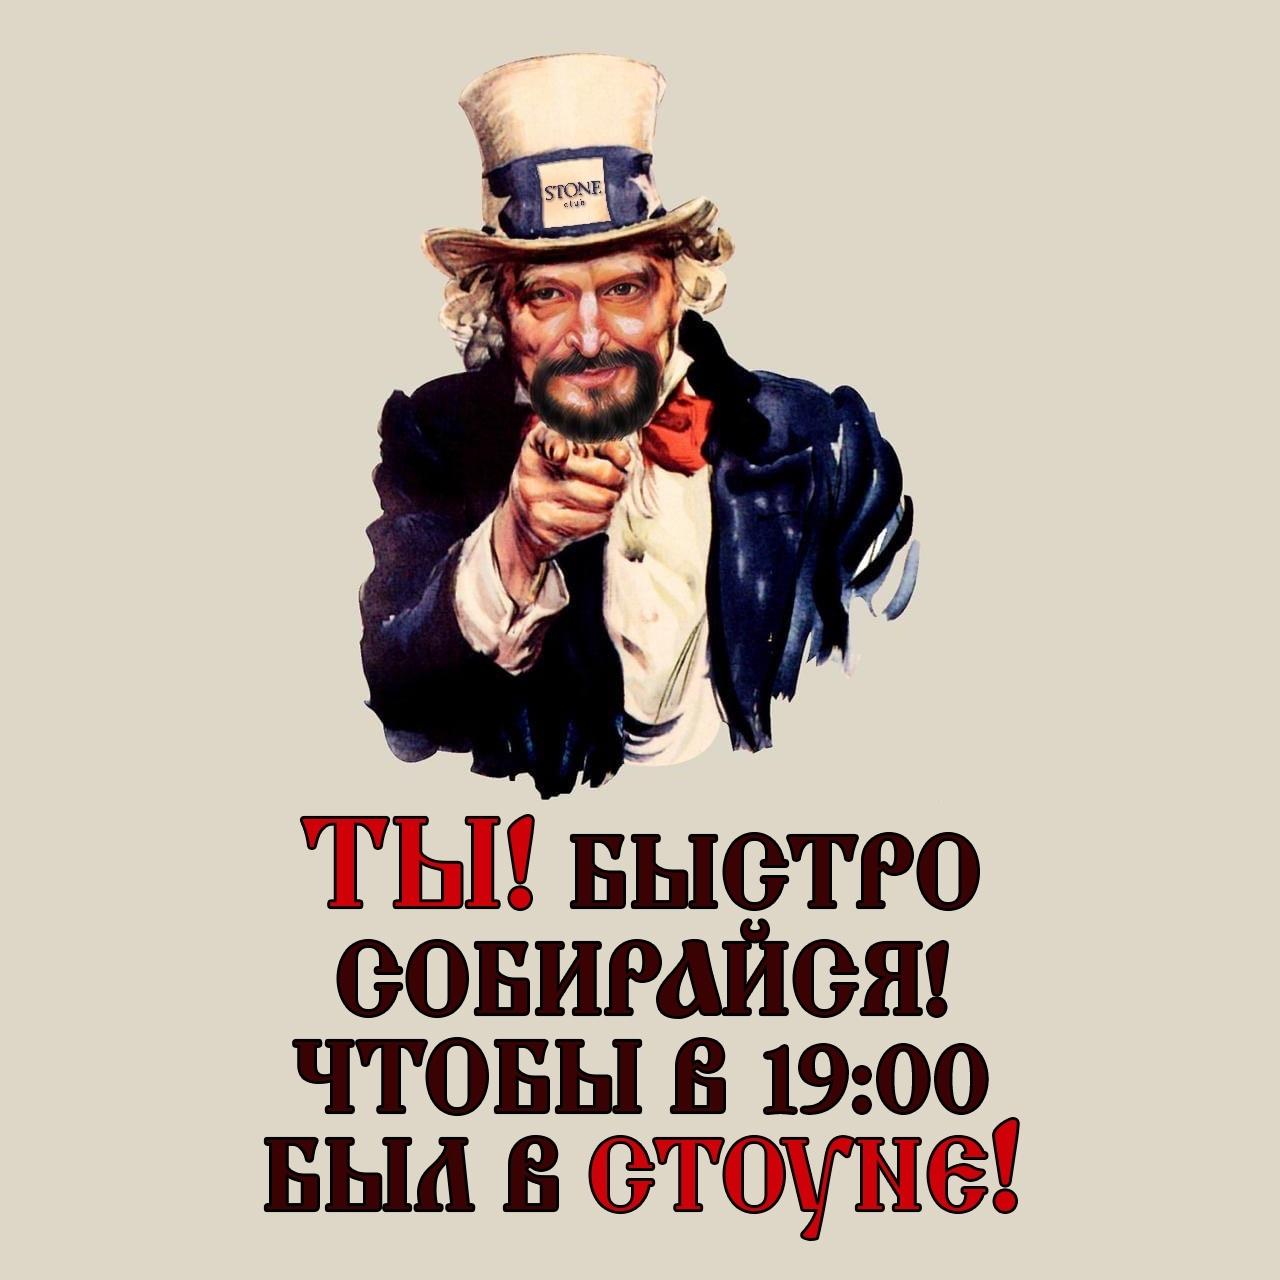 Кафе, кальянная, бар «l'eto cafe» - Вконтакте